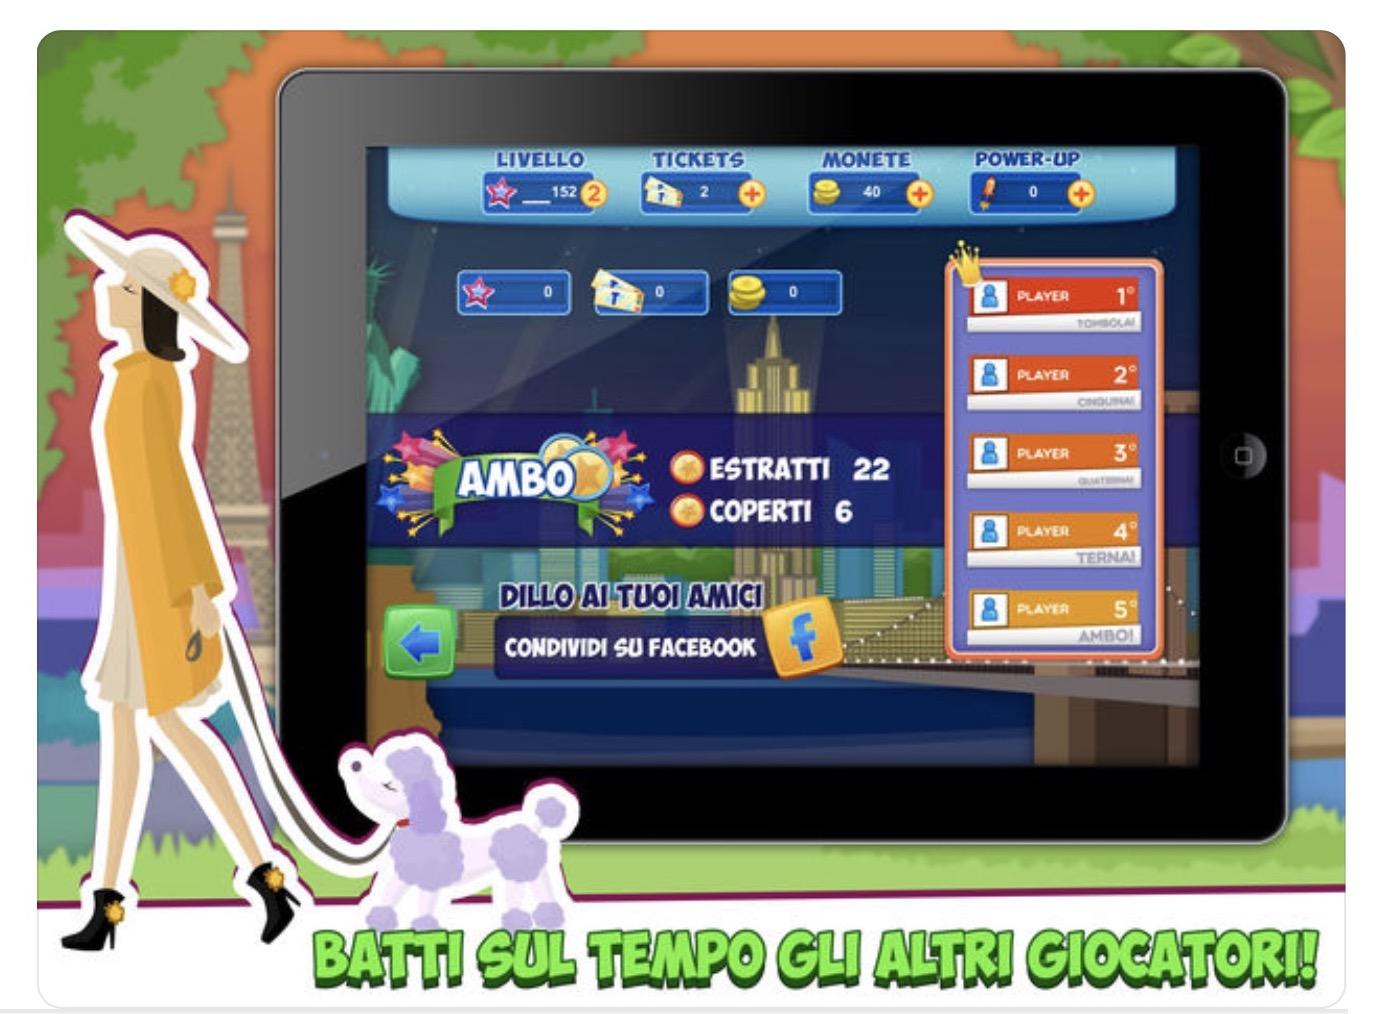 Le App per la Tombola su iPhone, iPad, Mac e Apple TV